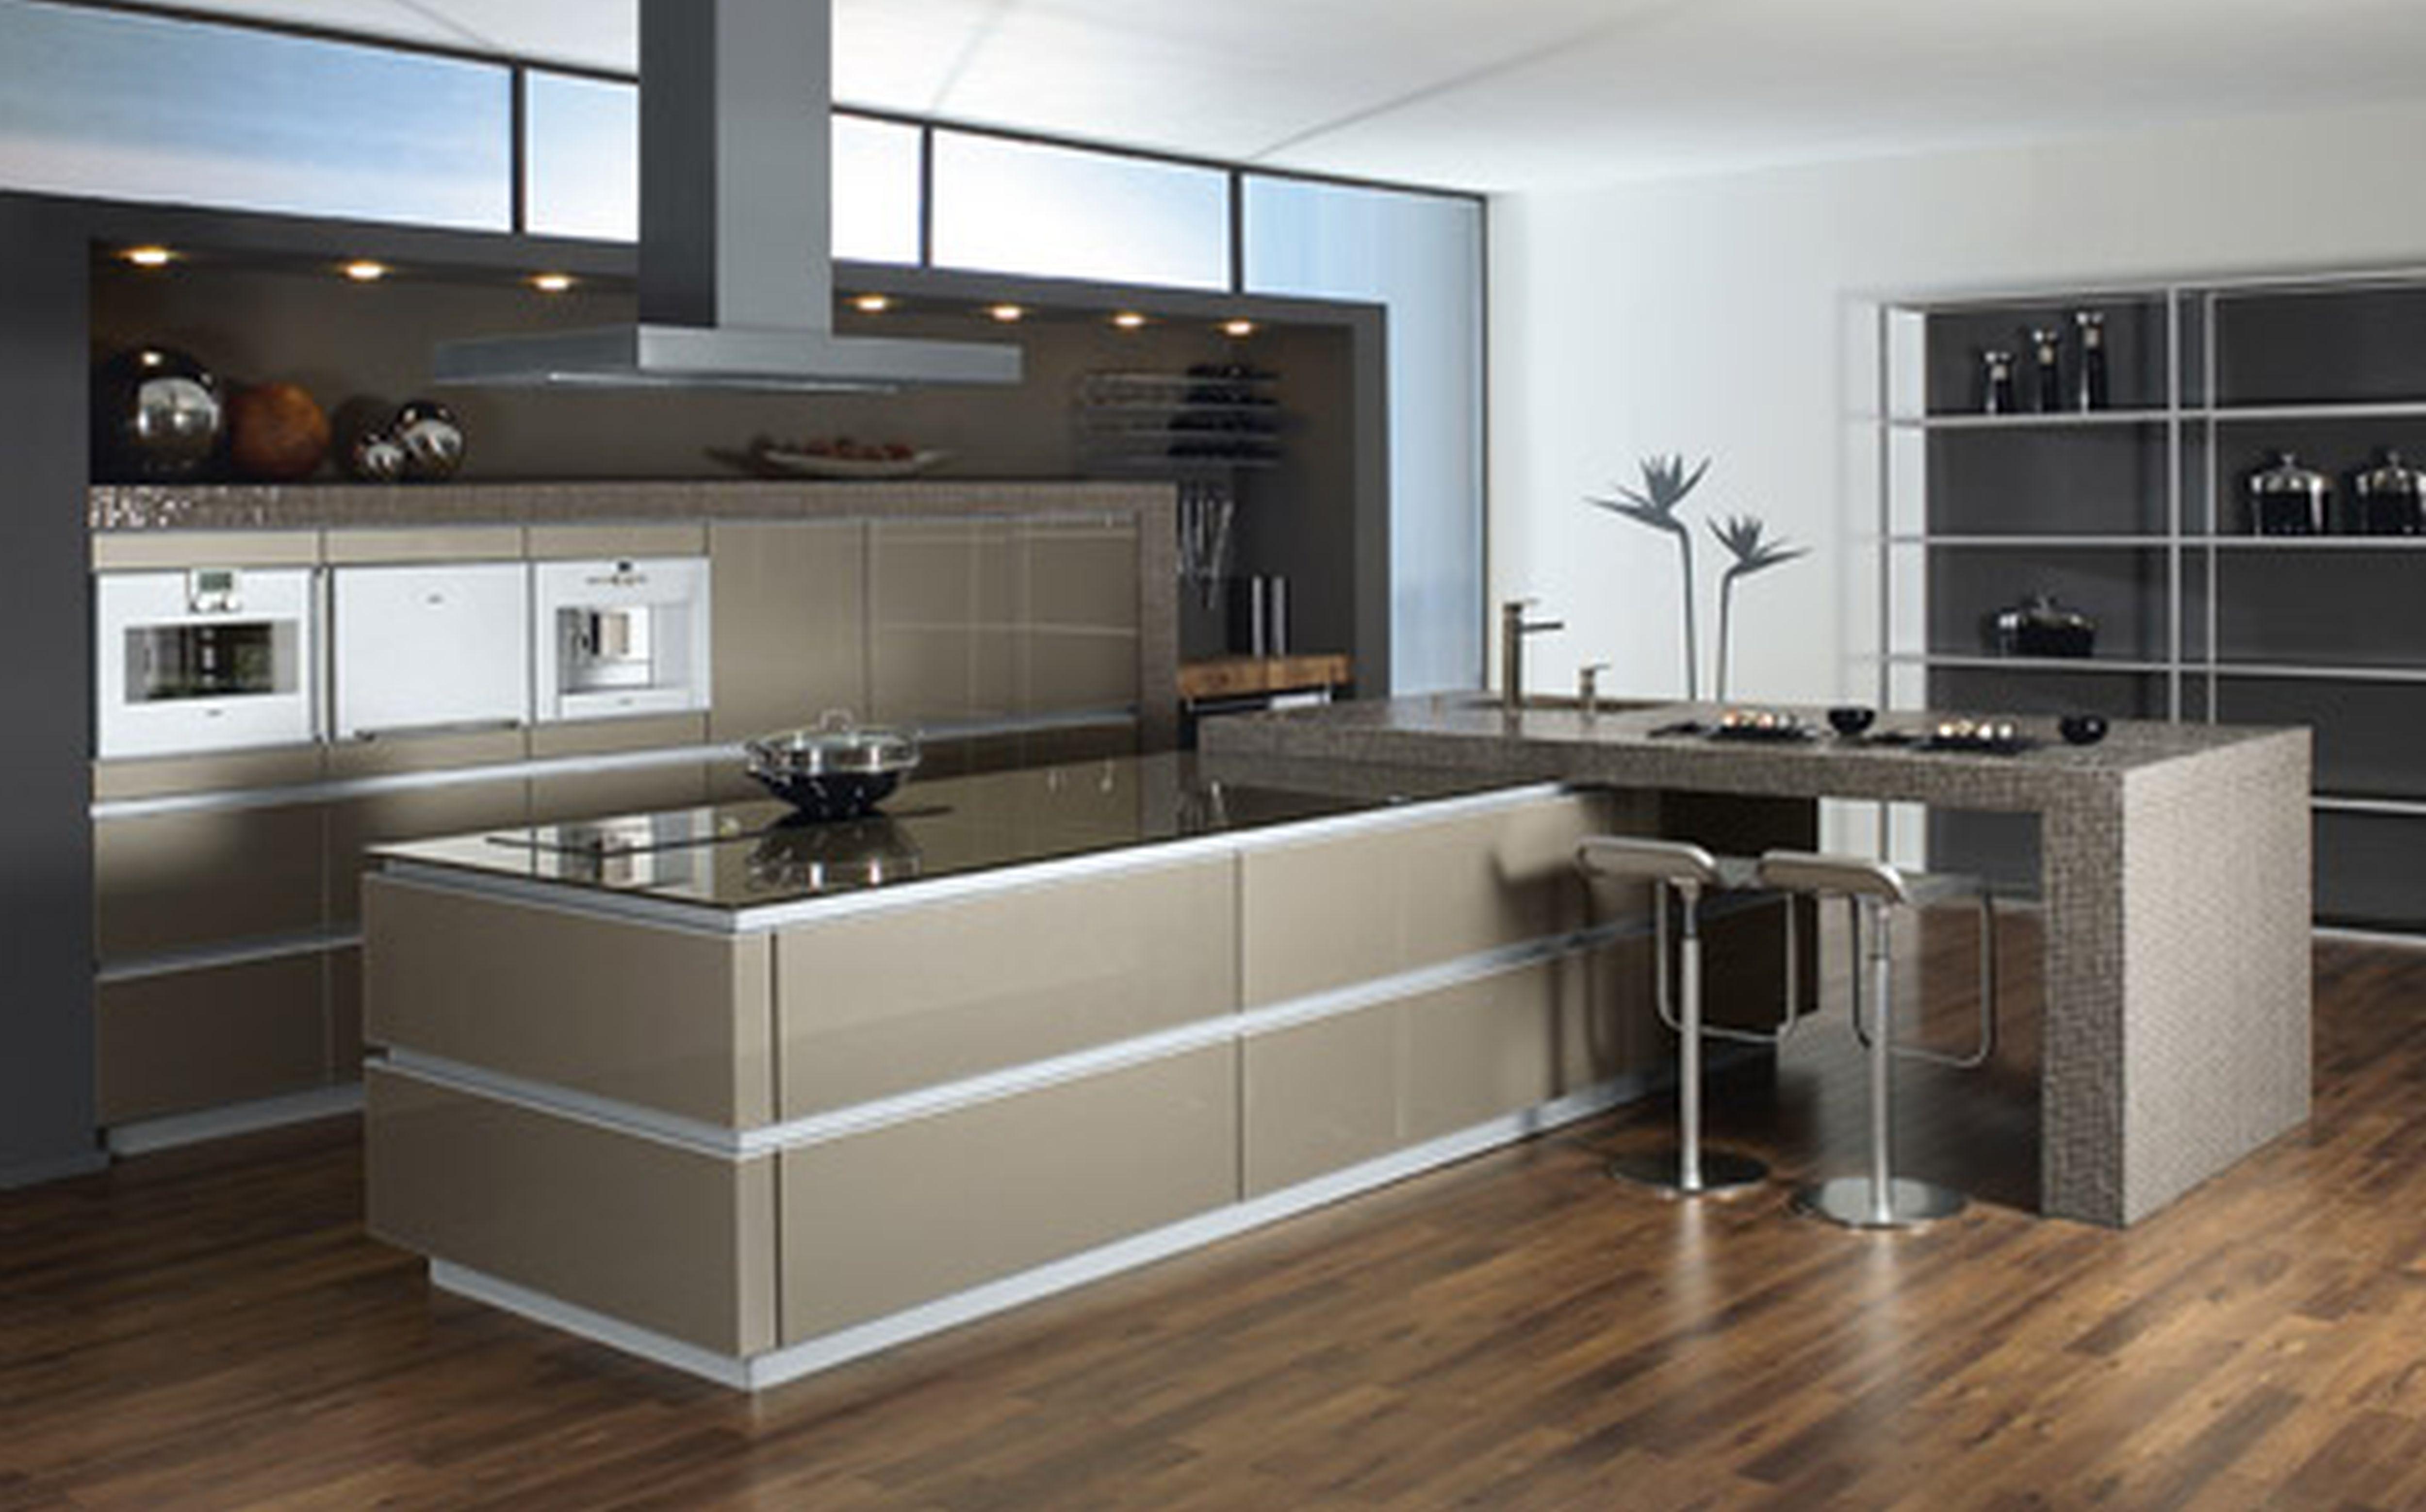 White moen kitchen faucet Photo - 2